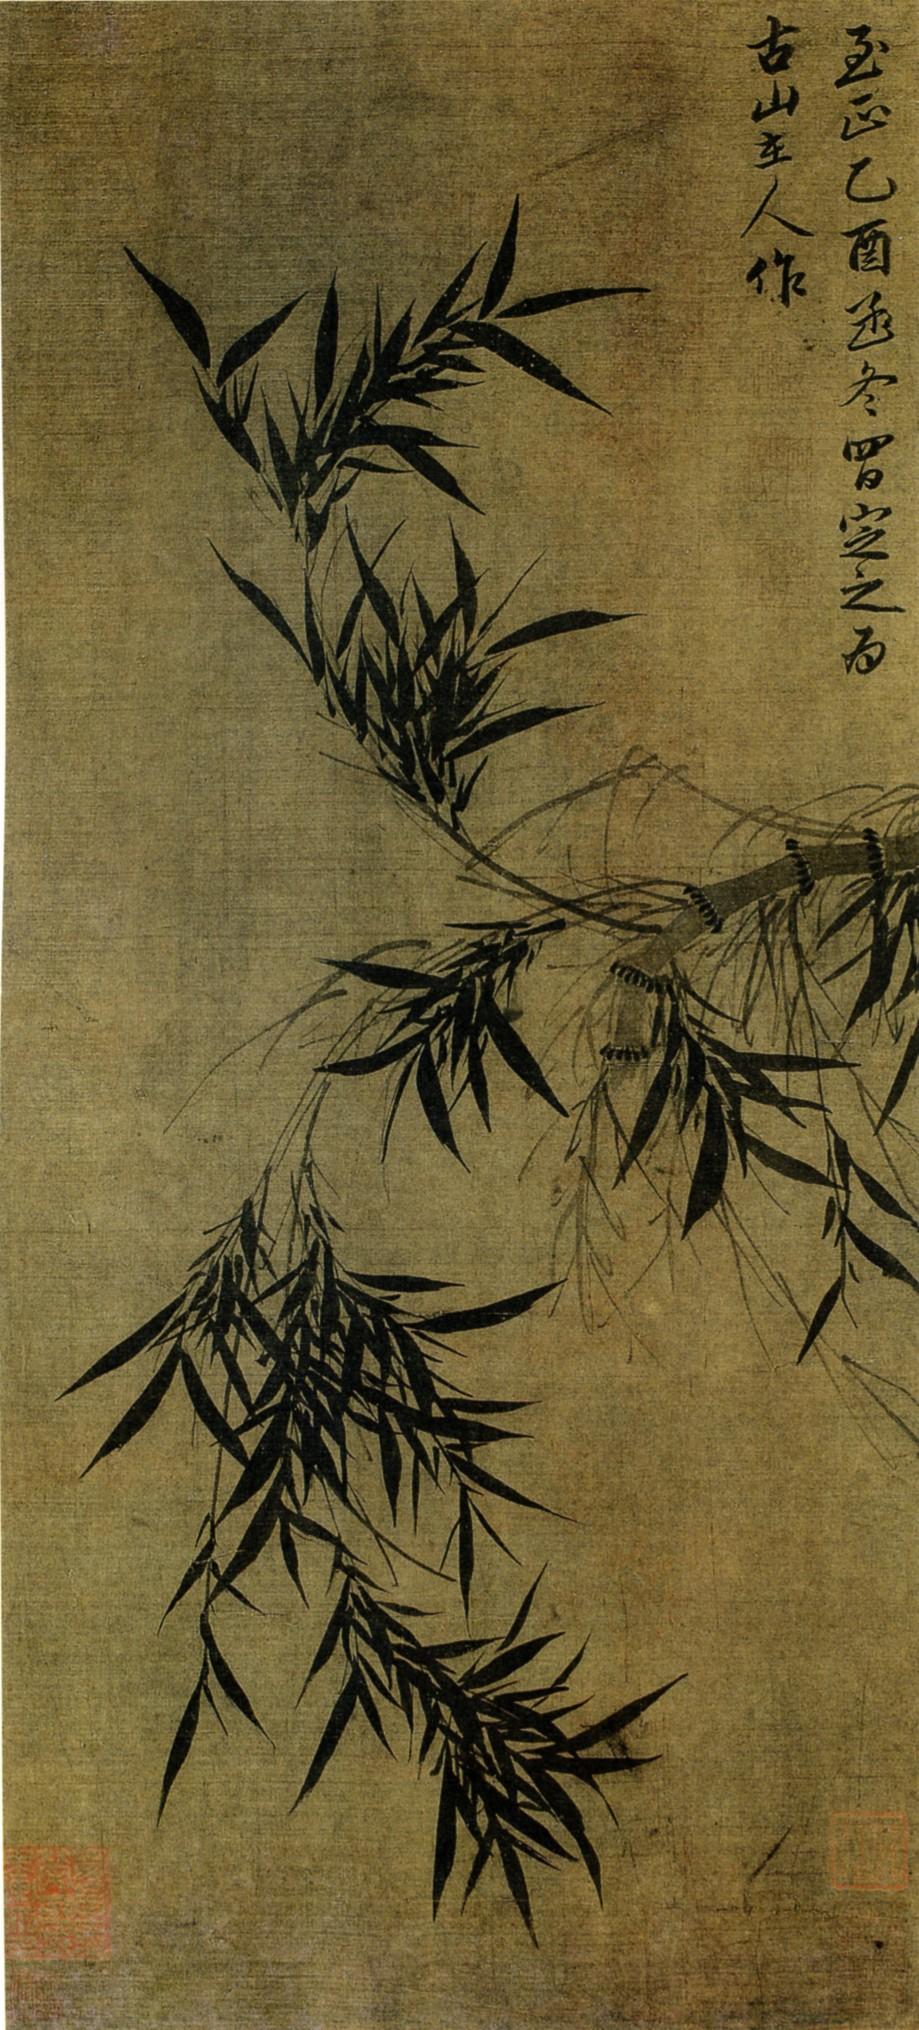 Gu_An-Ink_Bamboo.jpg